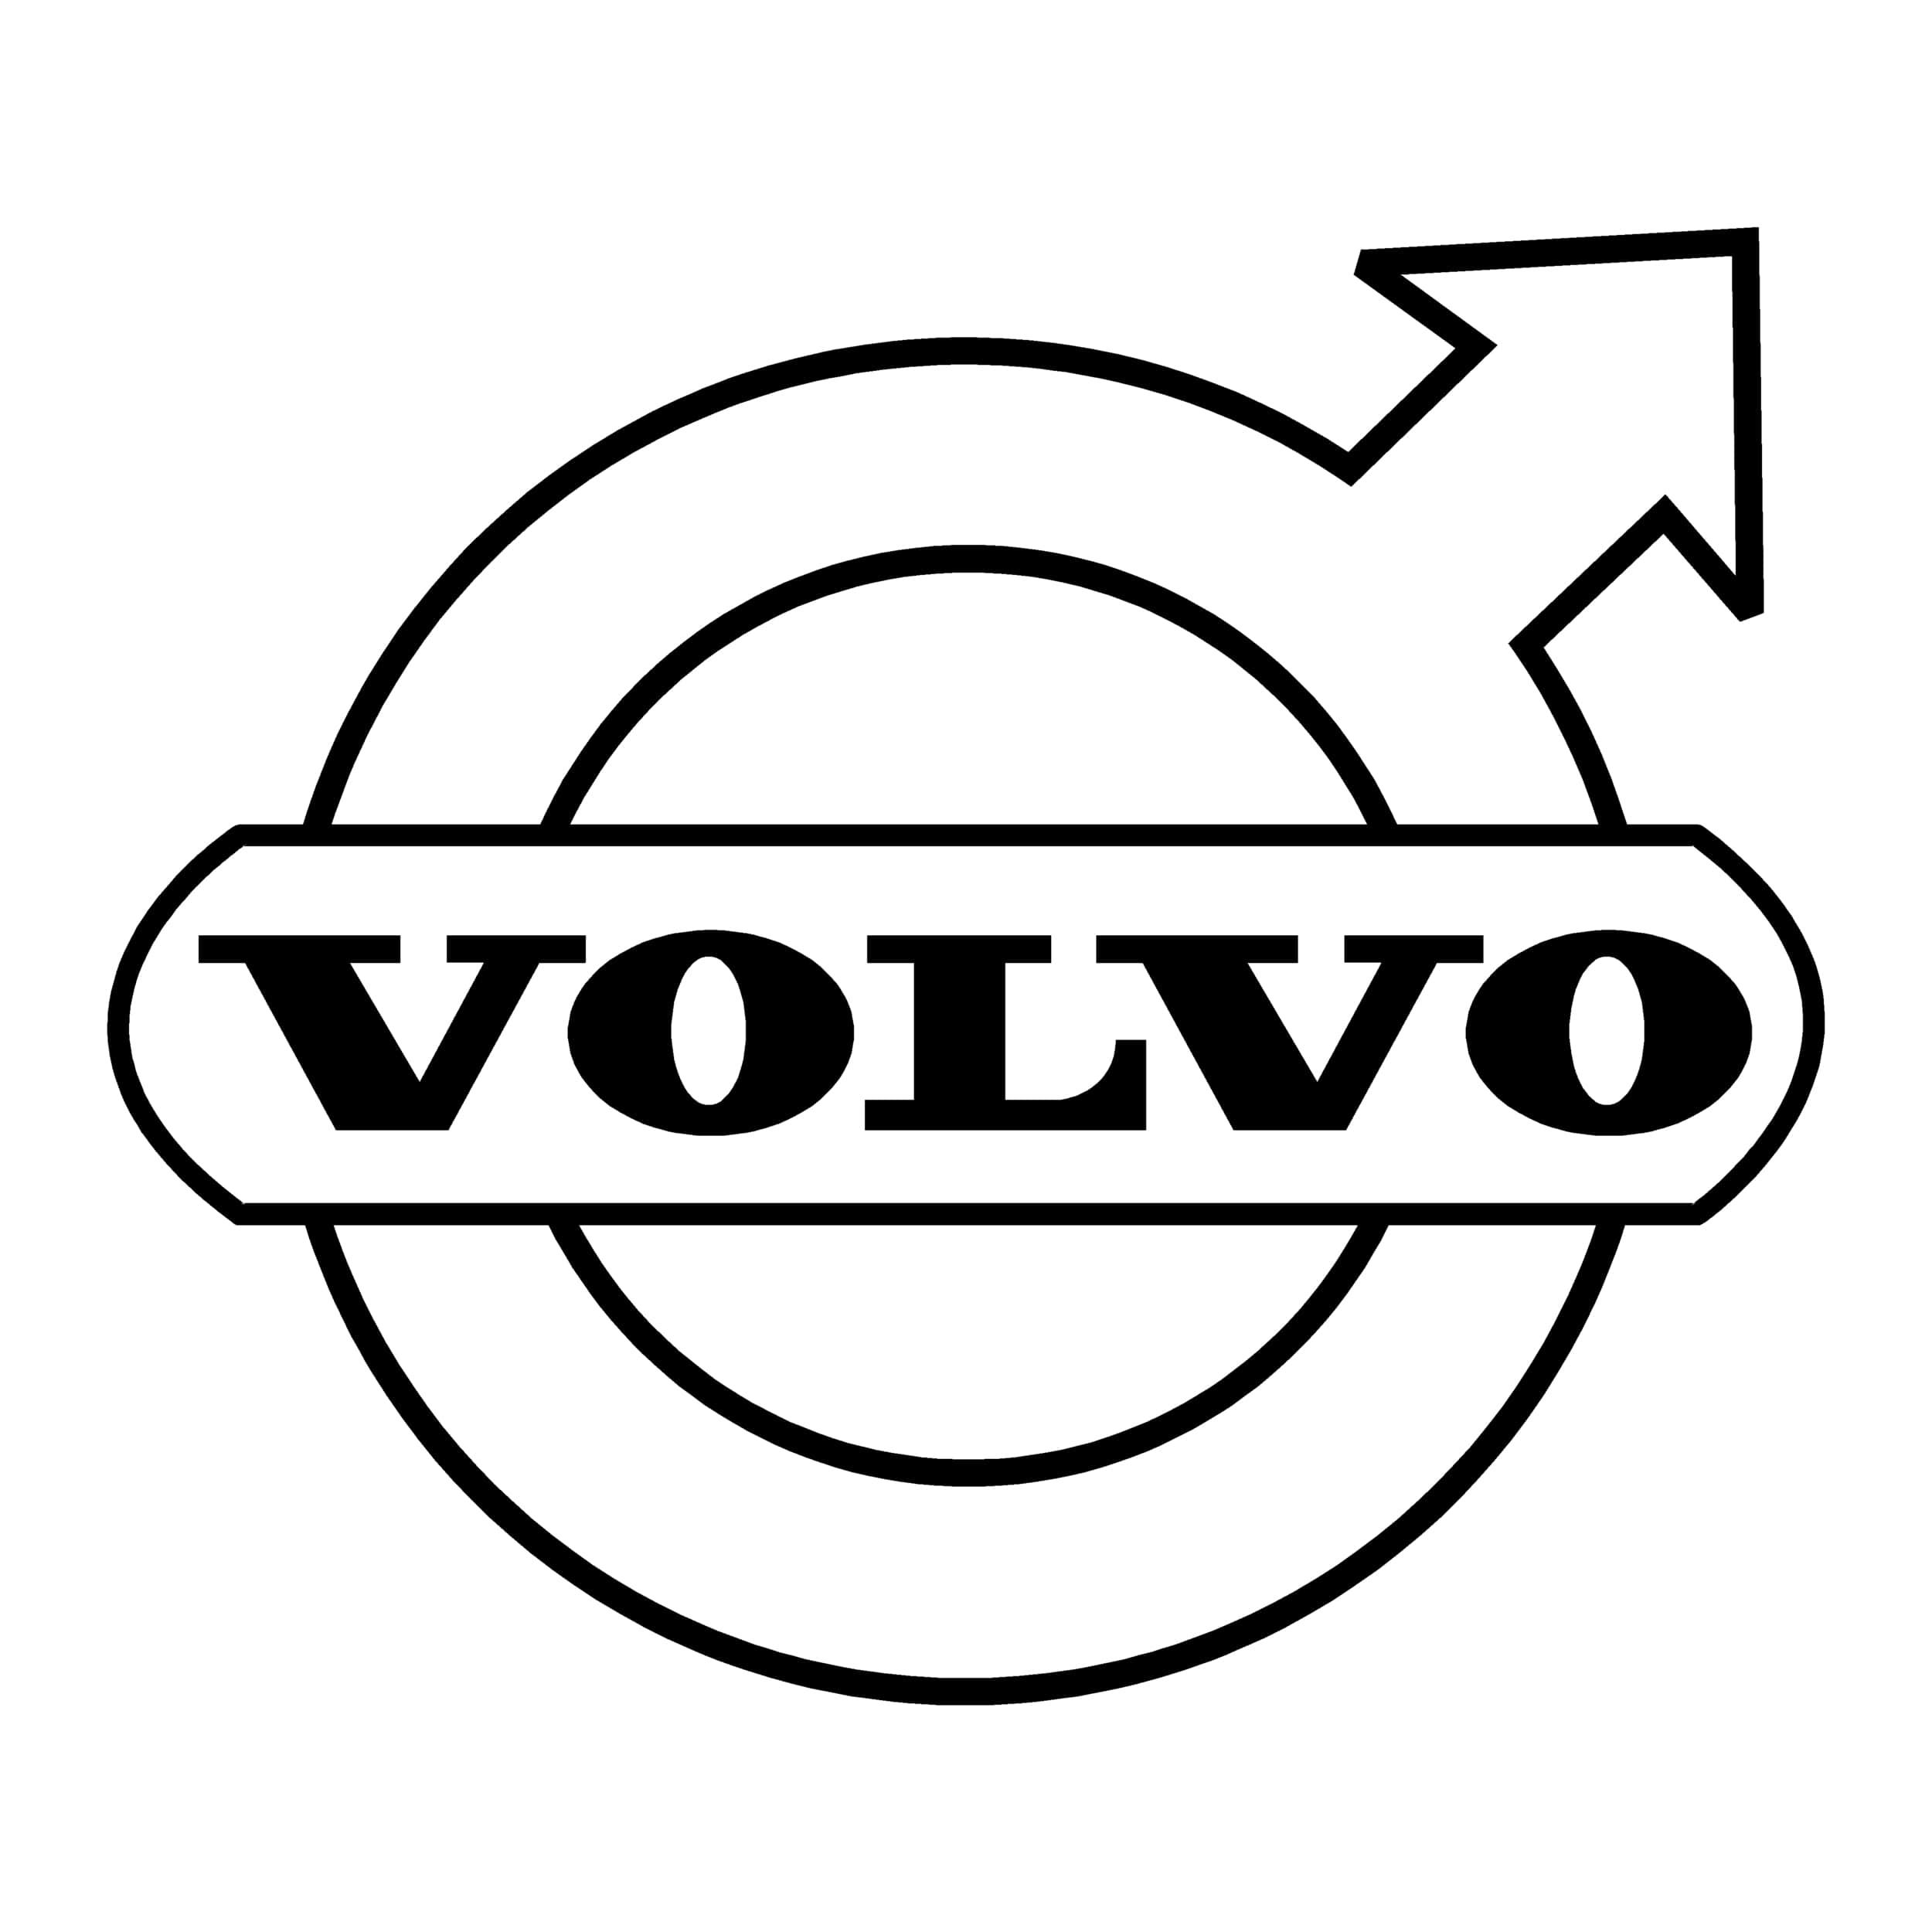 stickers-volvo-ref-10-auto-tuning-amortisseur-4x4-tout-terrain-auto-camion-competition-rallye-autocollant-min